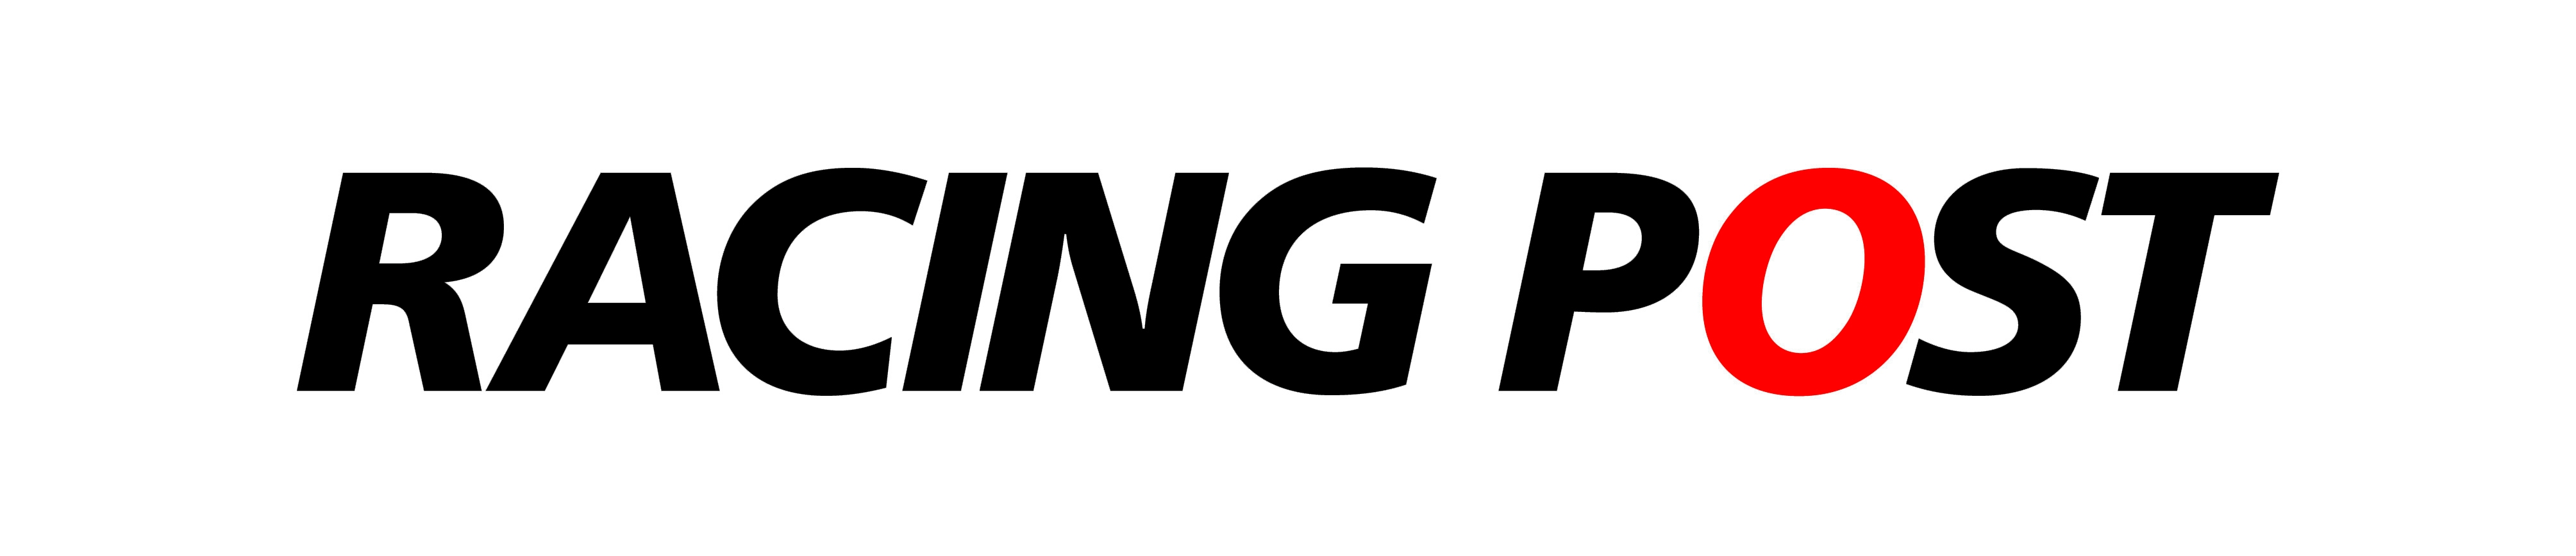 Racing-Post_Black_logo.jpg